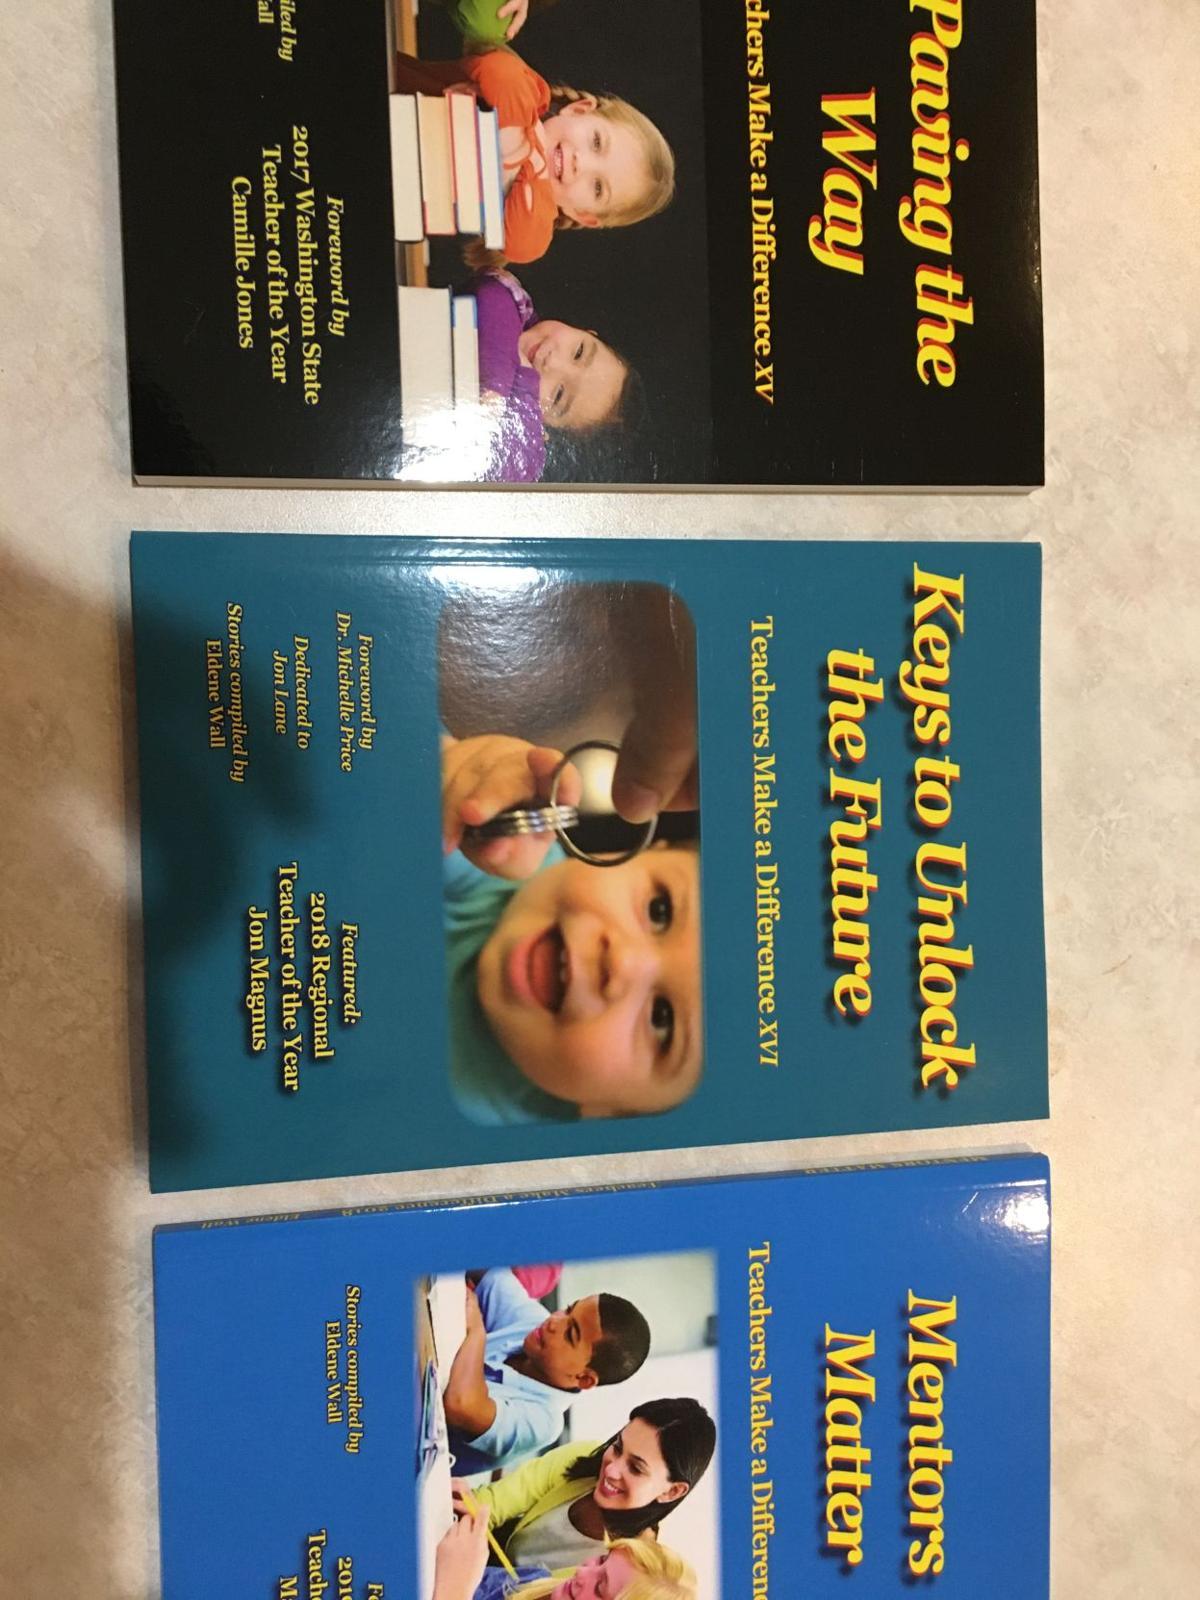 TMAD books.JPG